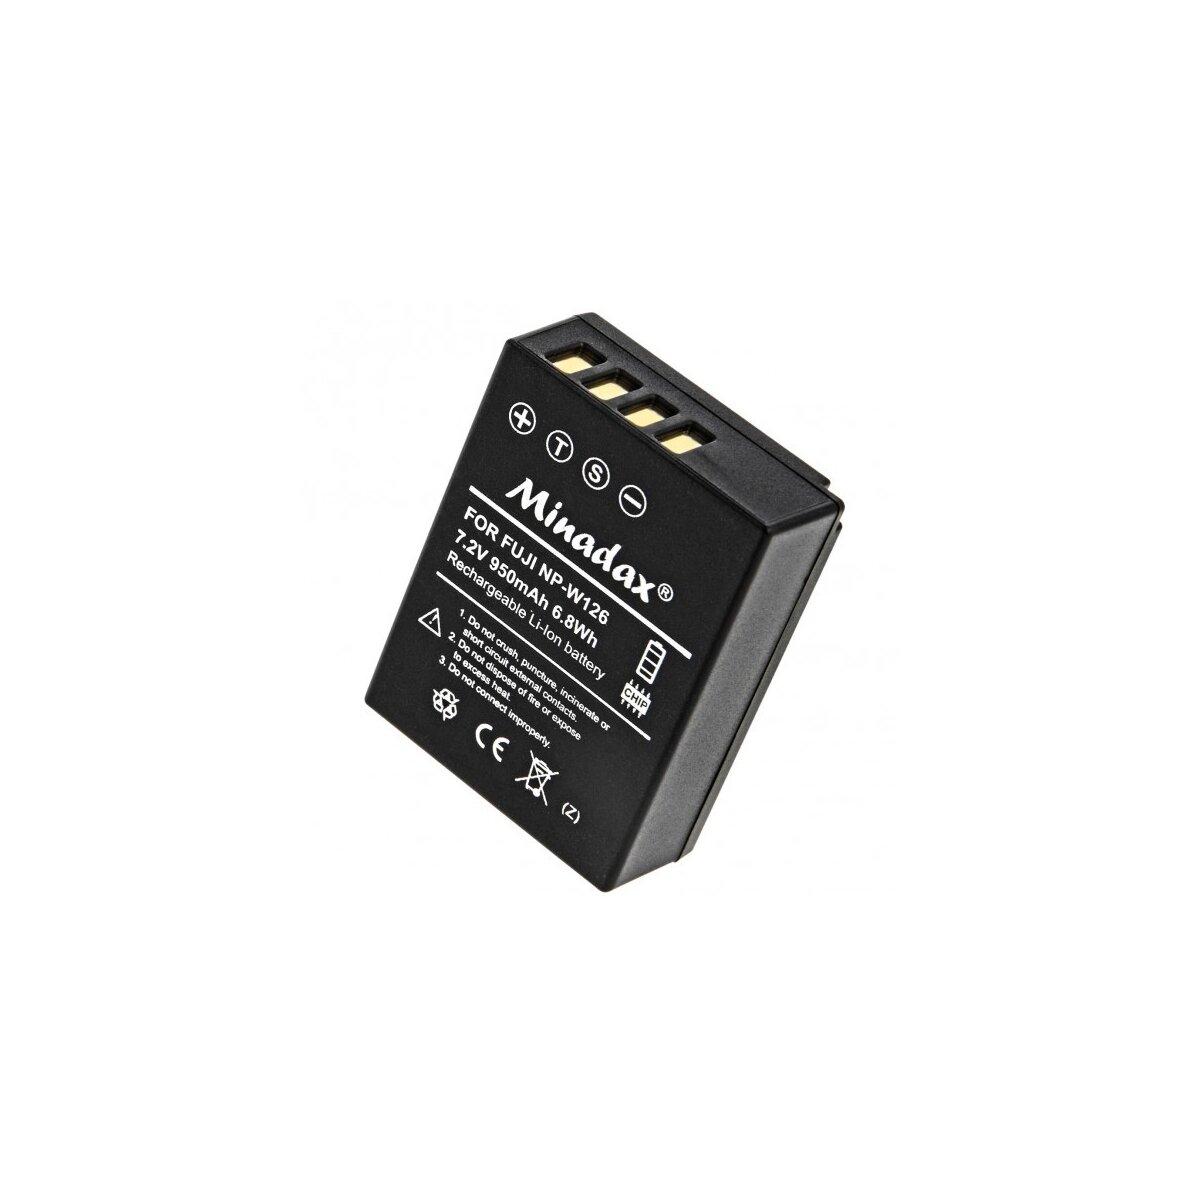 Minadax Qualitätsakku mit echten 950 mAh kompatibel für FujiFilm FinePix HS30EXR, HS33EXR, HS50EXR, X-A1, X-E1, X-E2, X-M1, X-Pro1, Ersatz für NP-W126 - Intelligentes Akkusystem mit Chip